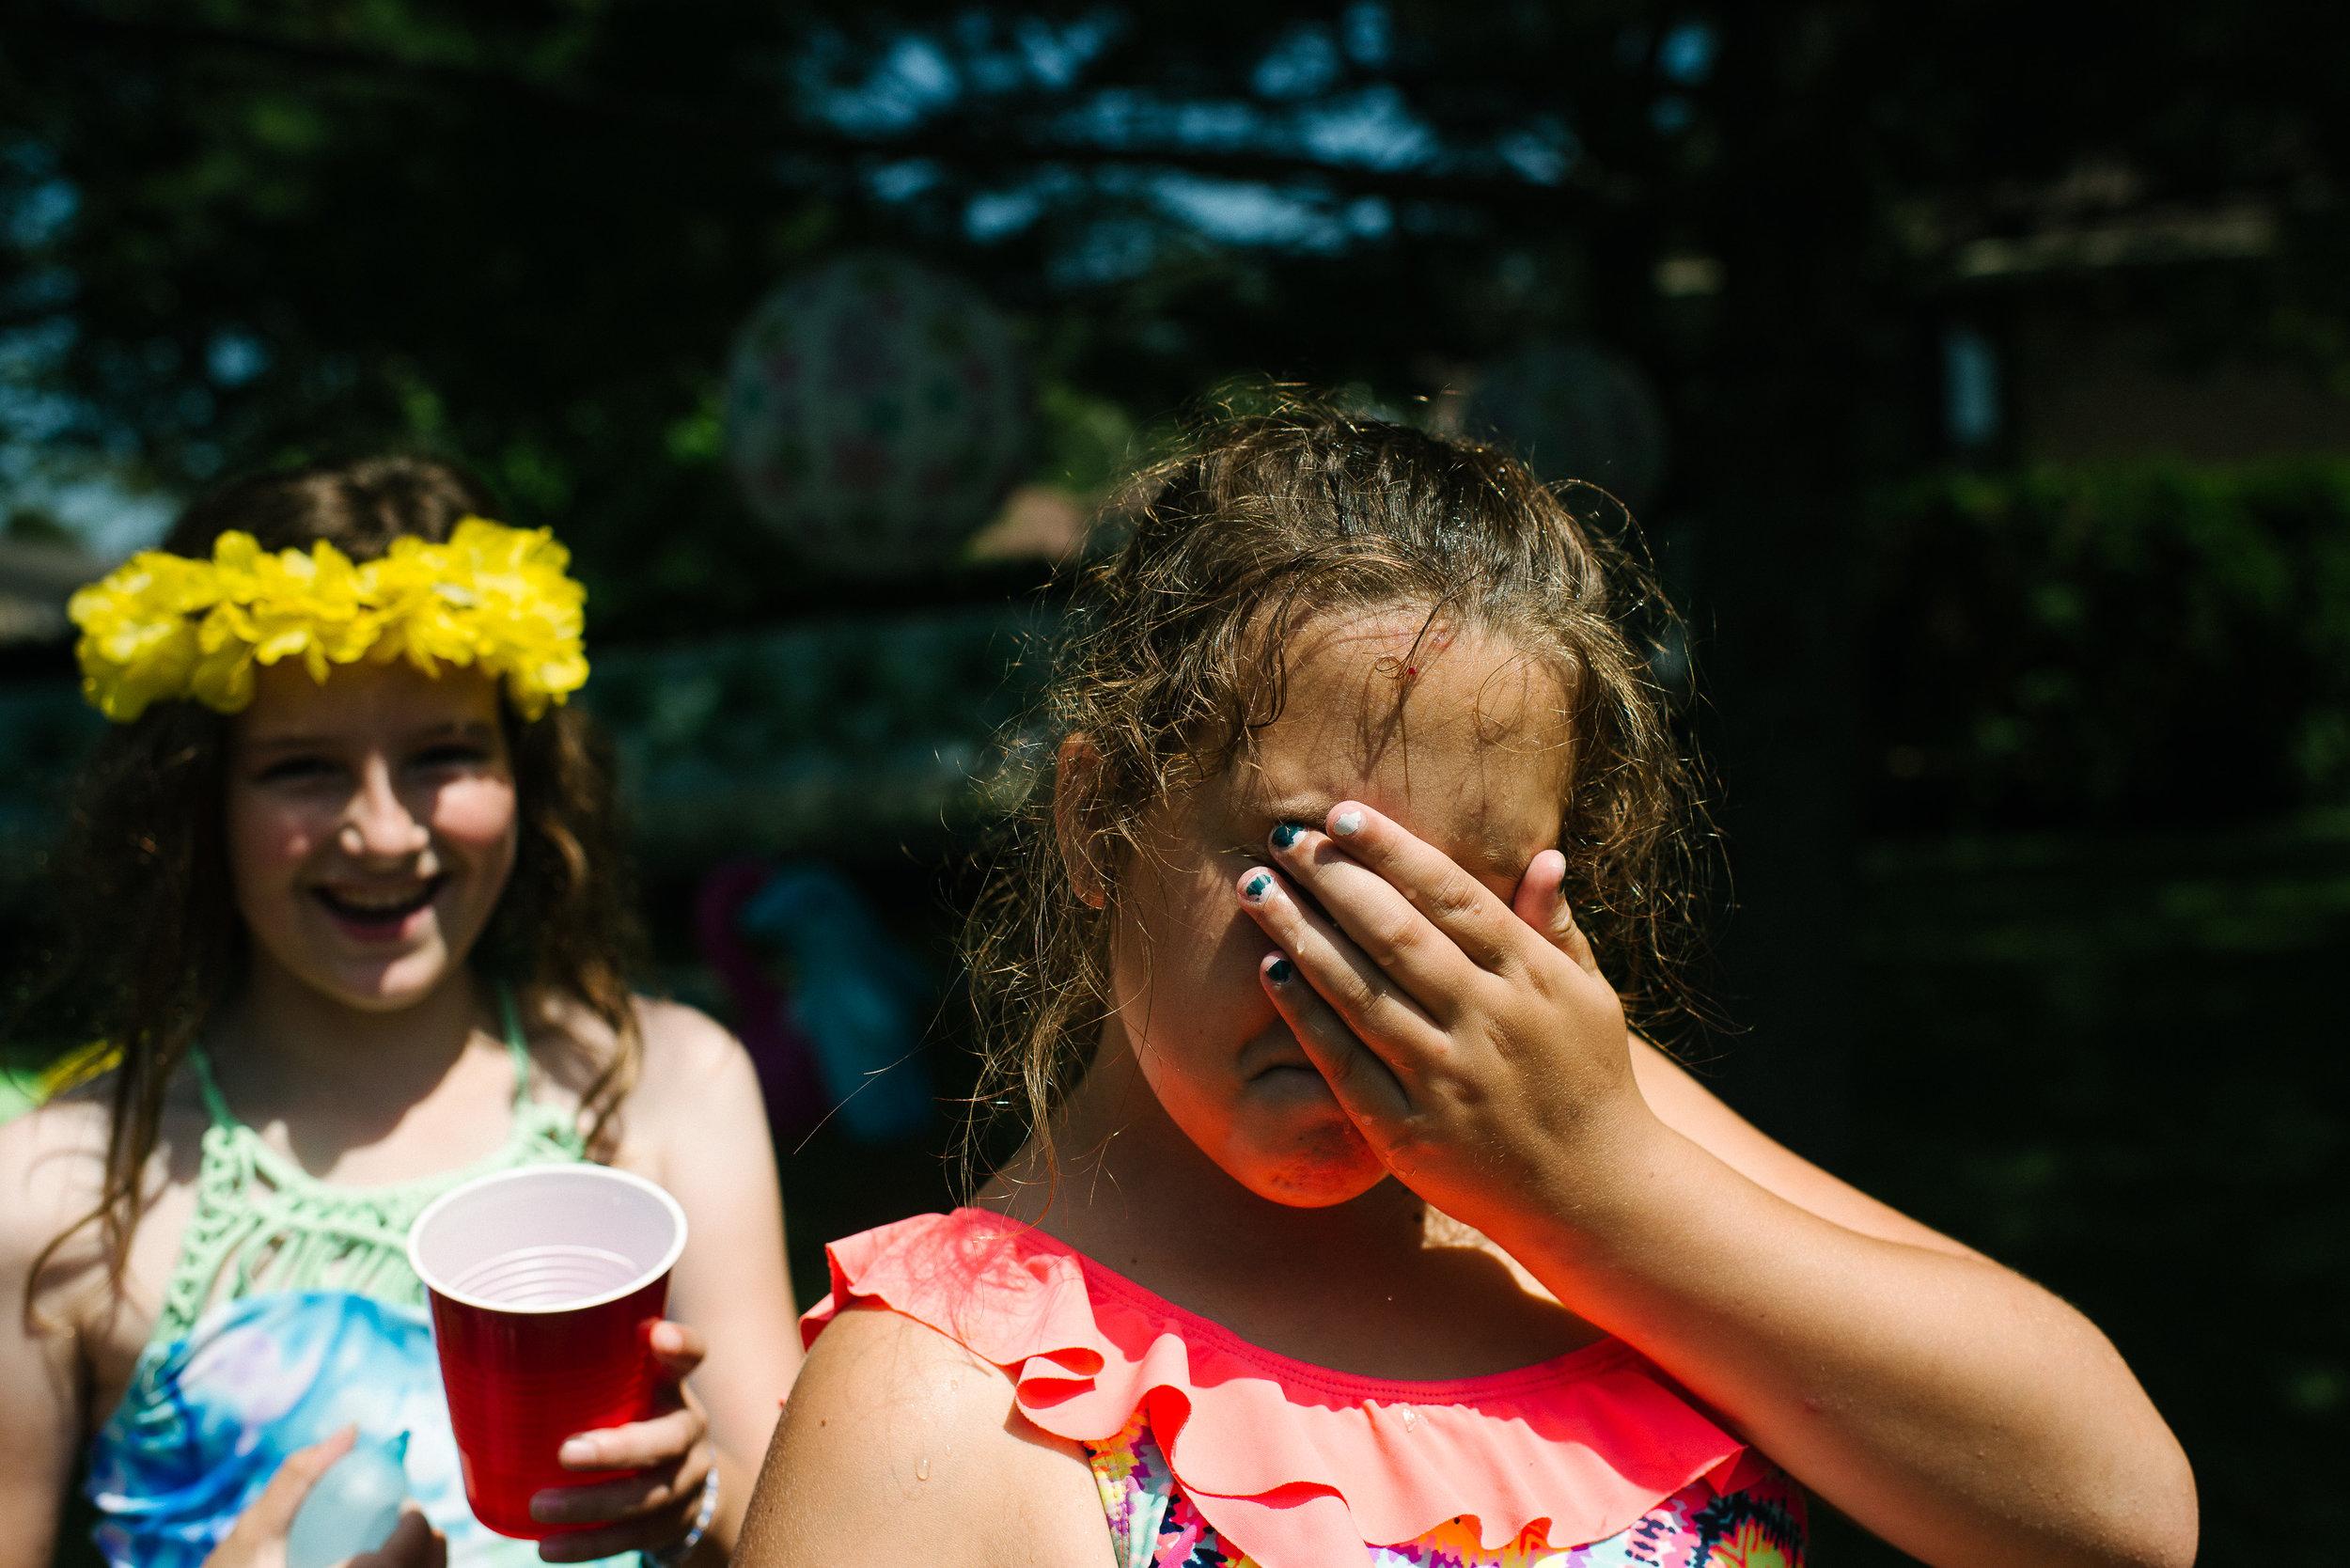 girl birthday party photography kingston-141907vm.jpg